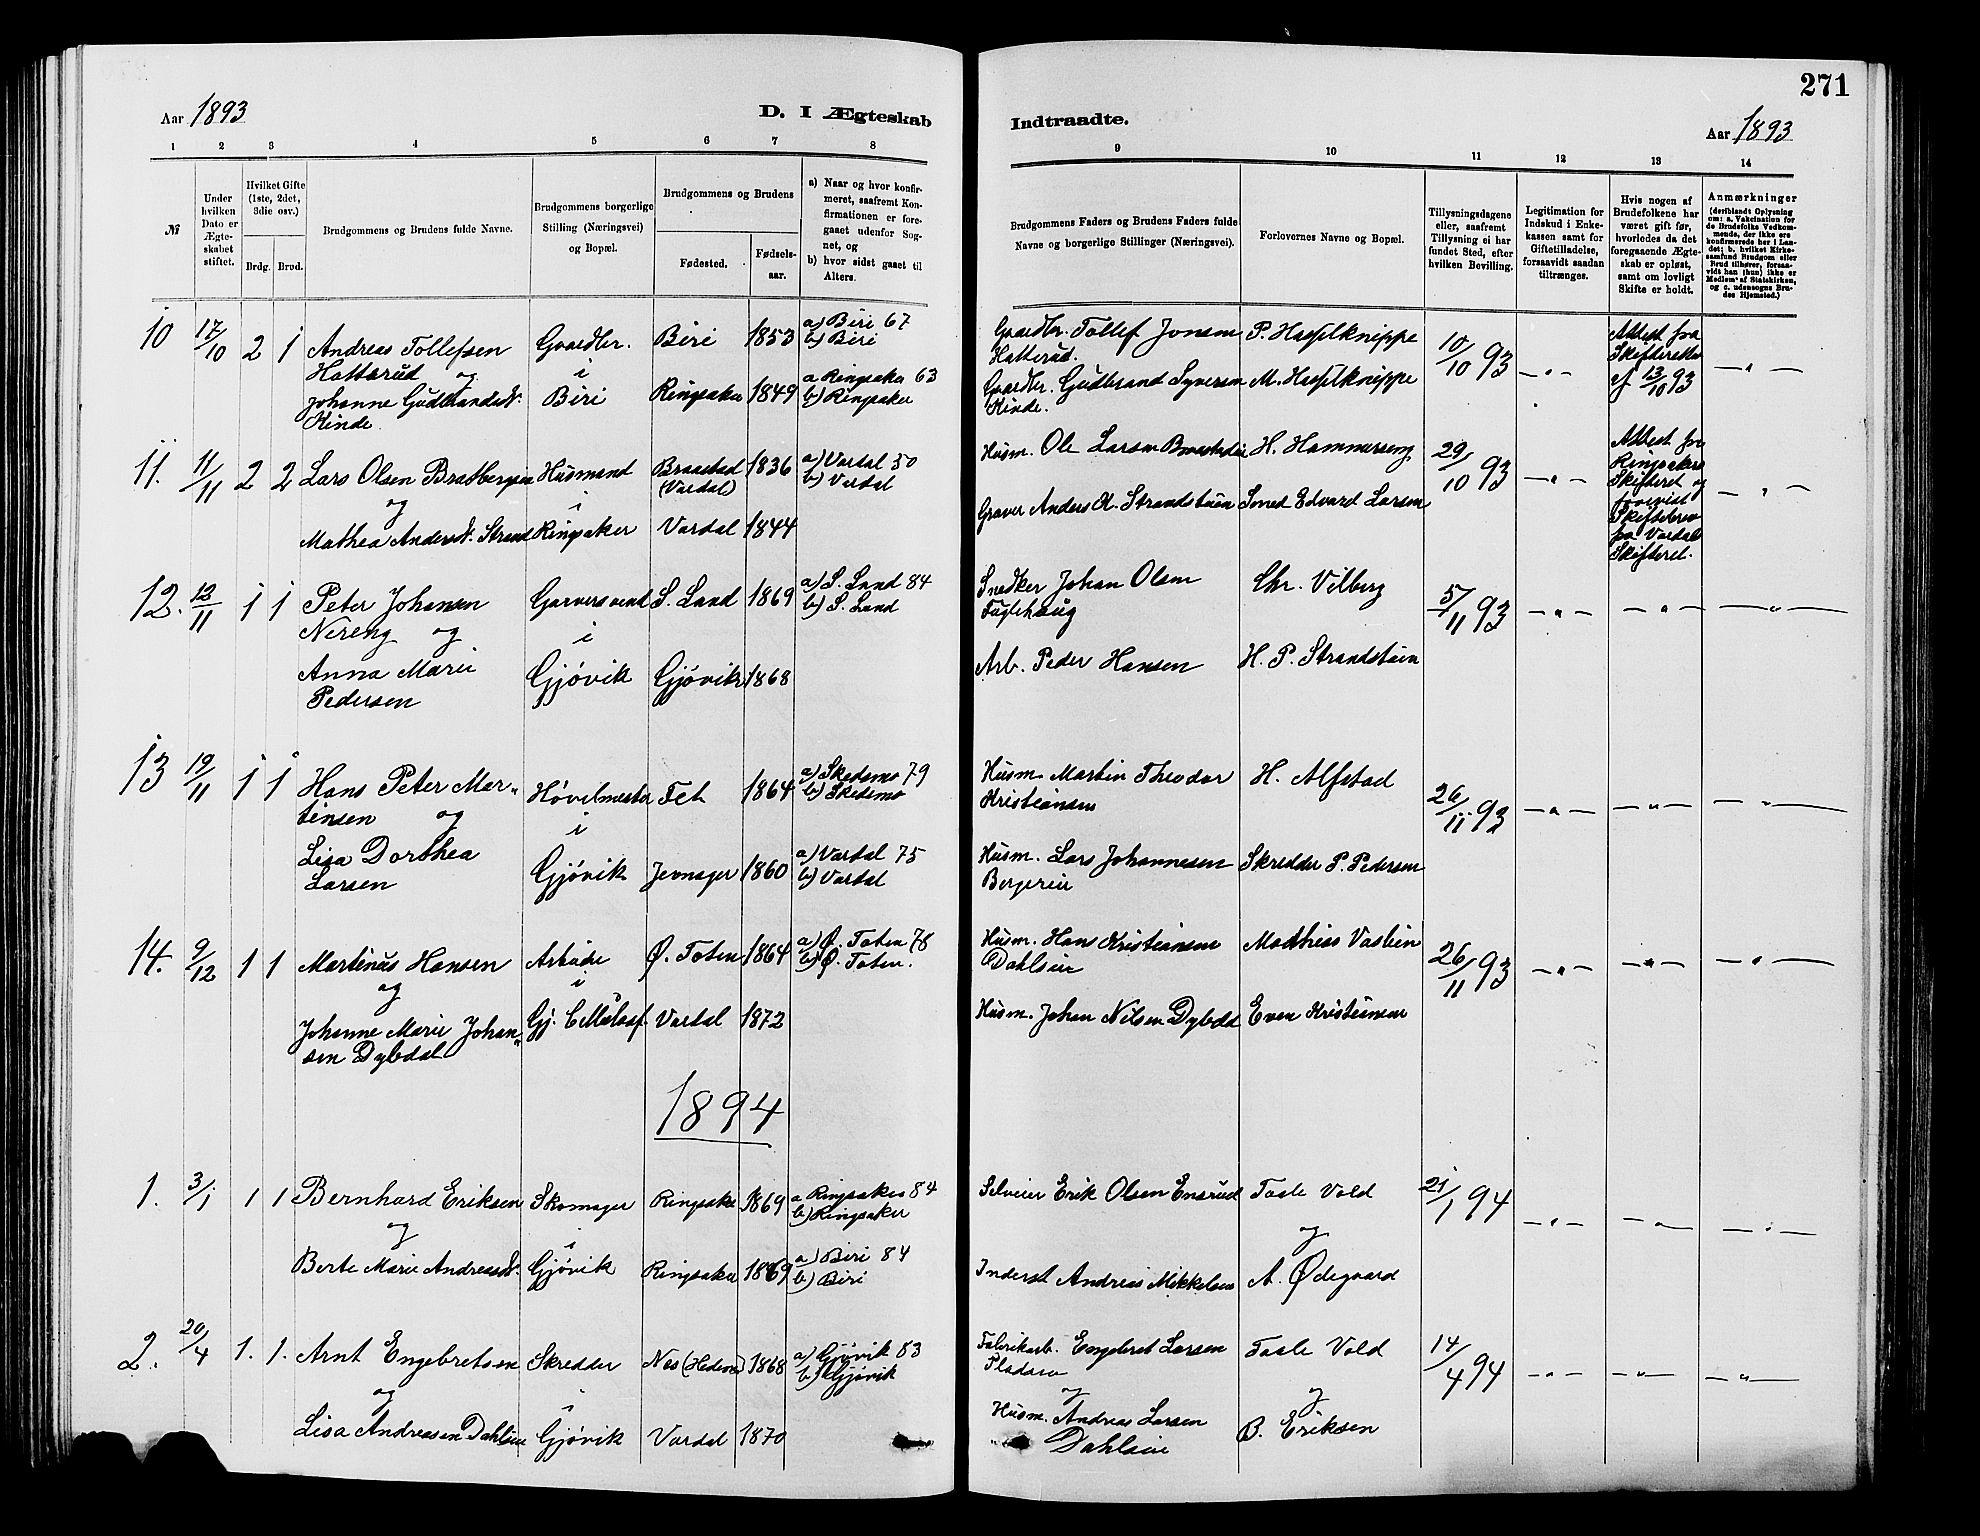 SAH, Vardal prestekontor, H/Ha/Hab/L0007: Klokkerbok nr. 7 /2, 1881-1895, s. 271